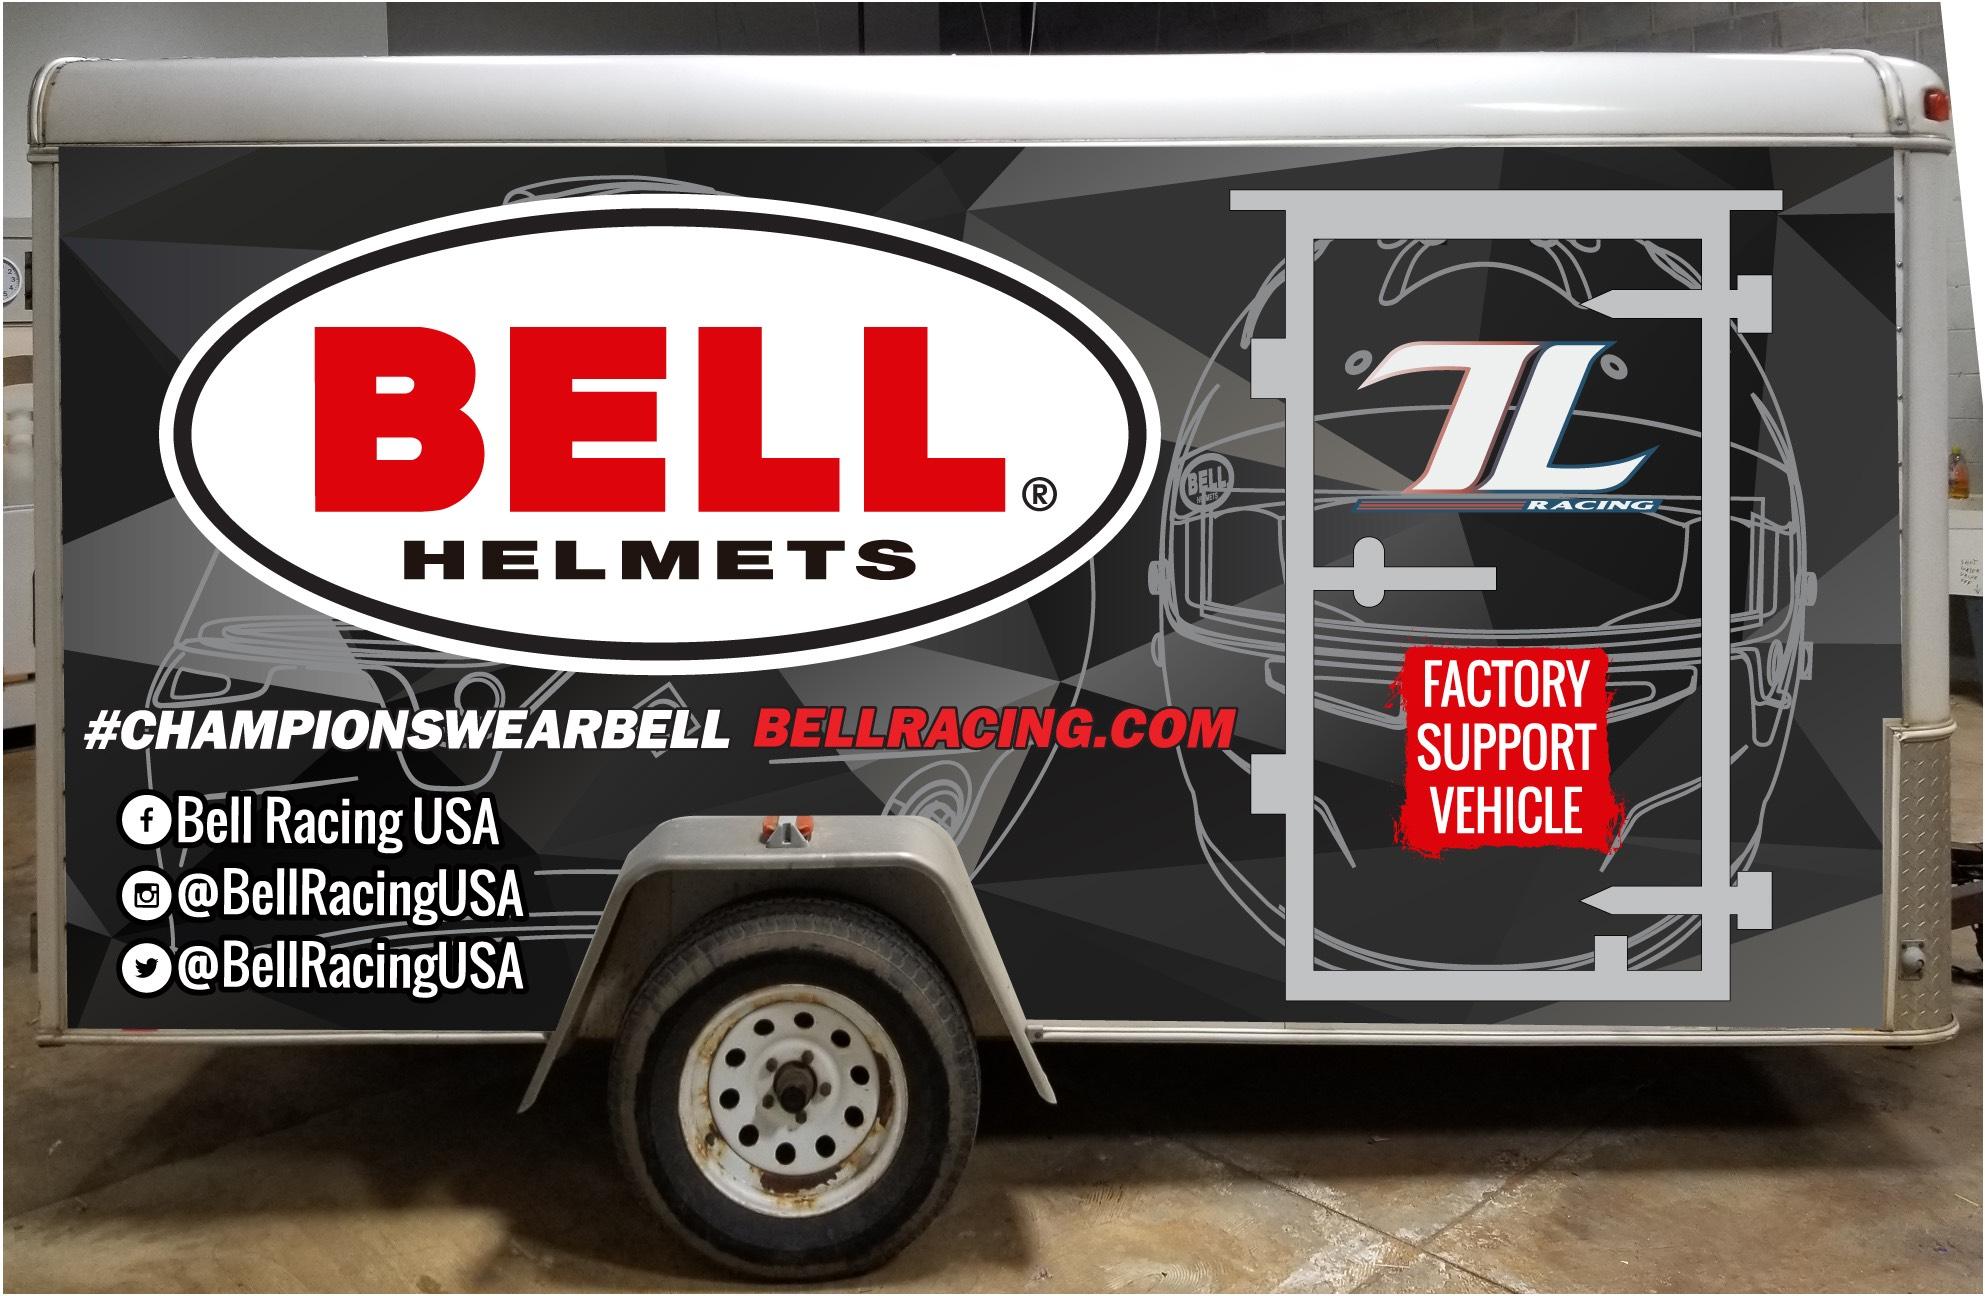 Bell Racing USA Partners with TL Racing LLC For New Pilot Program